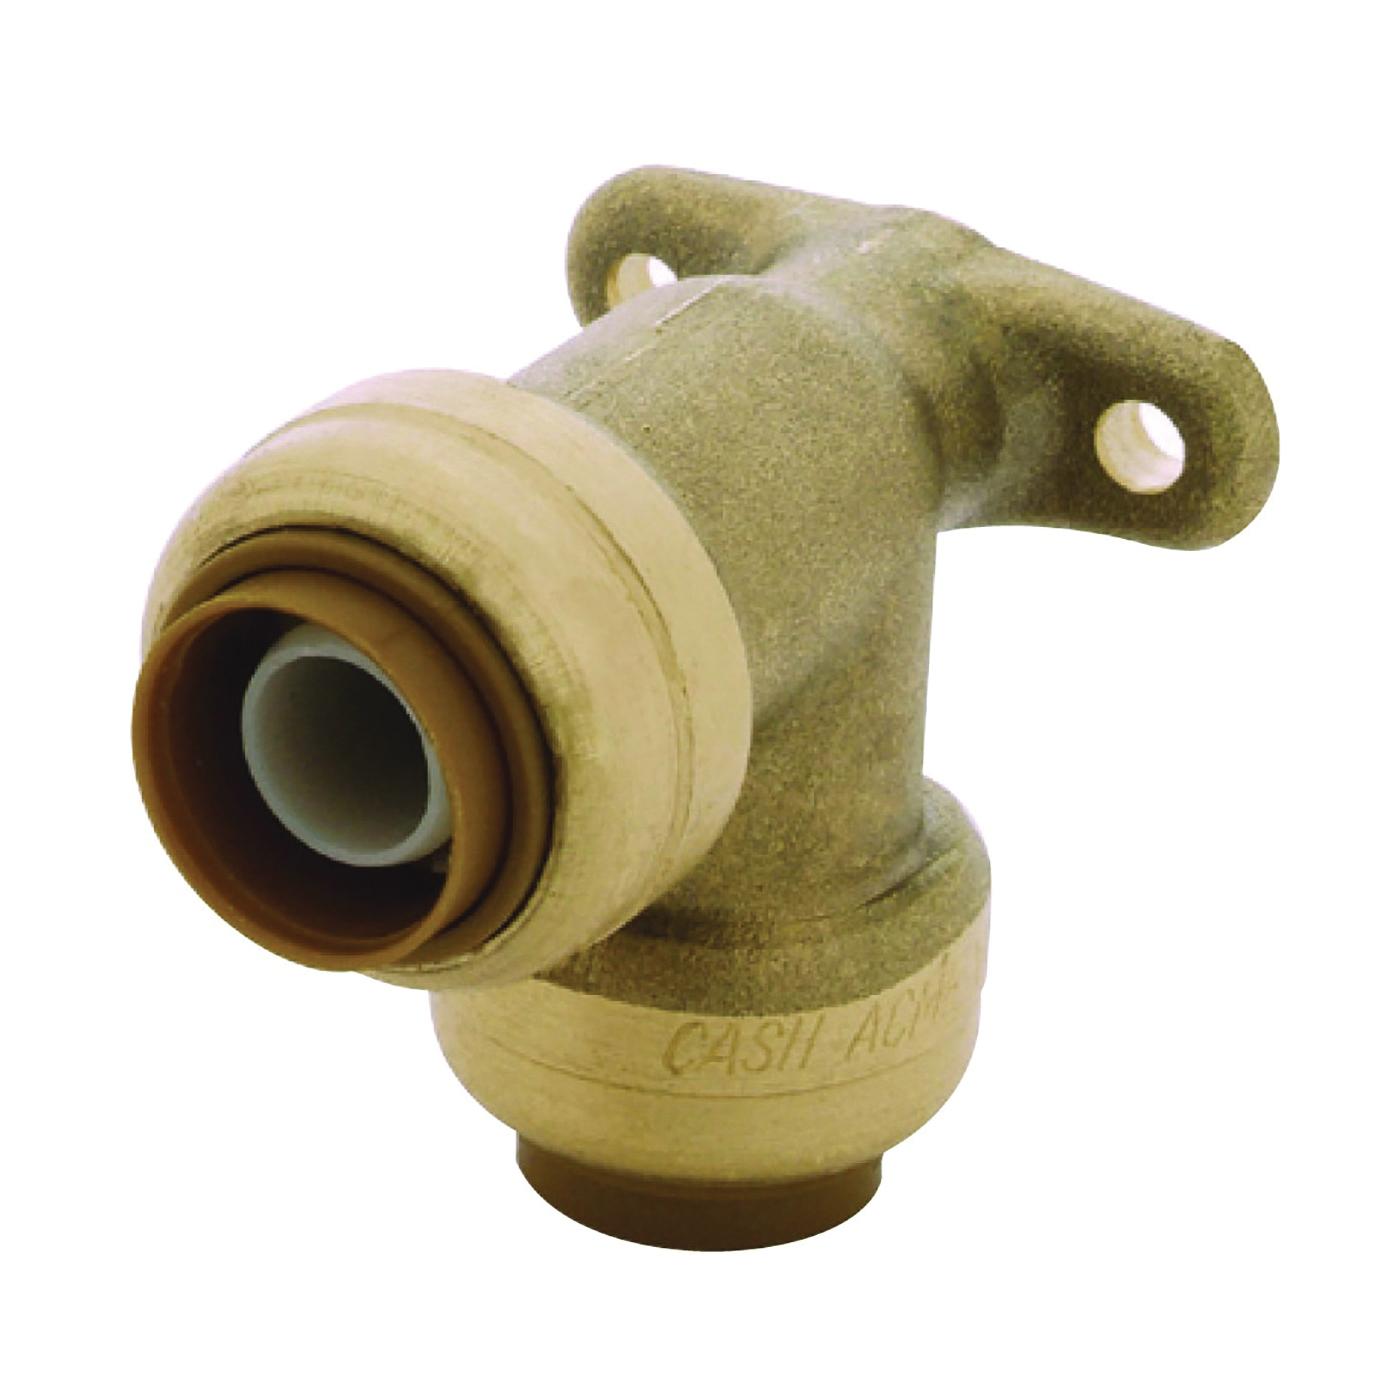 Picture of SharkBite U249LFA Tube Elbow, 1/2 in, 90 deg Angle, Brass, 200 psi Pressure